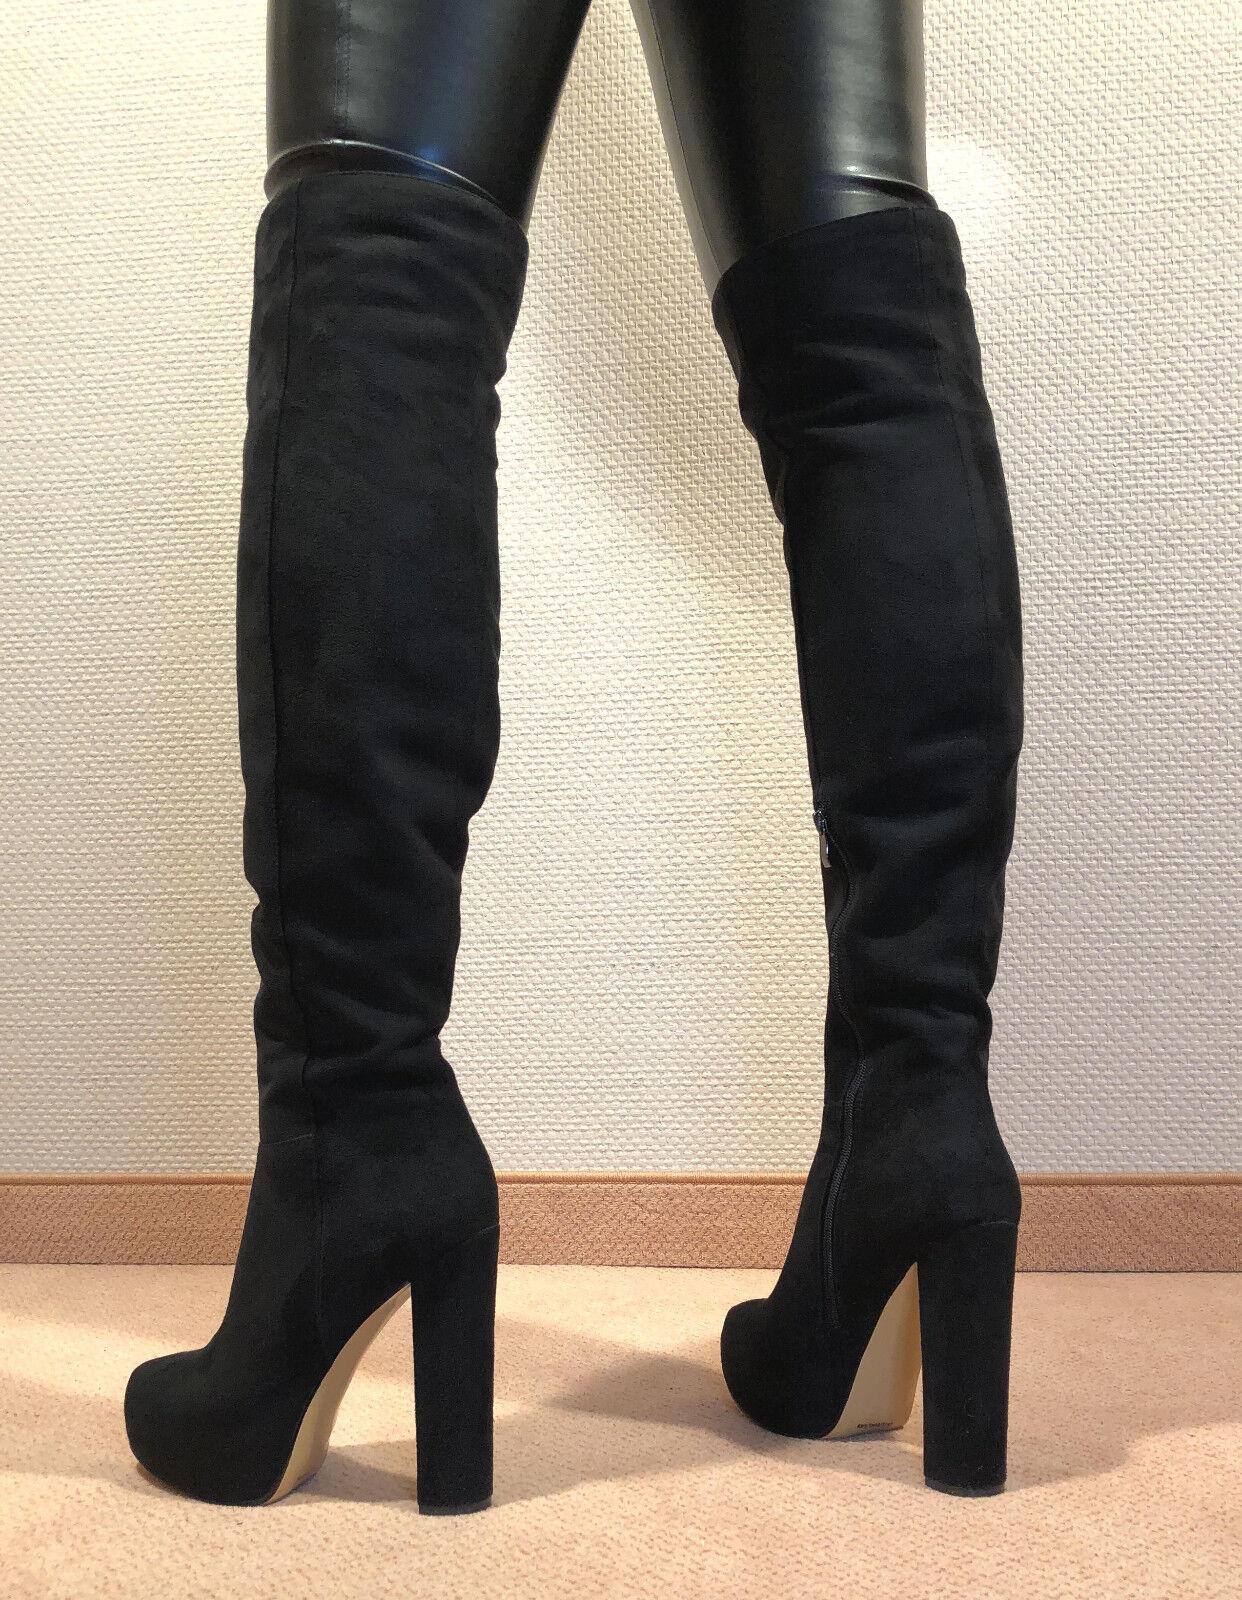 Talla 43 top  en exclusiva sexy zapatos señora señora señora botas altas botas de plataforma hombres botas d5  solo para ti